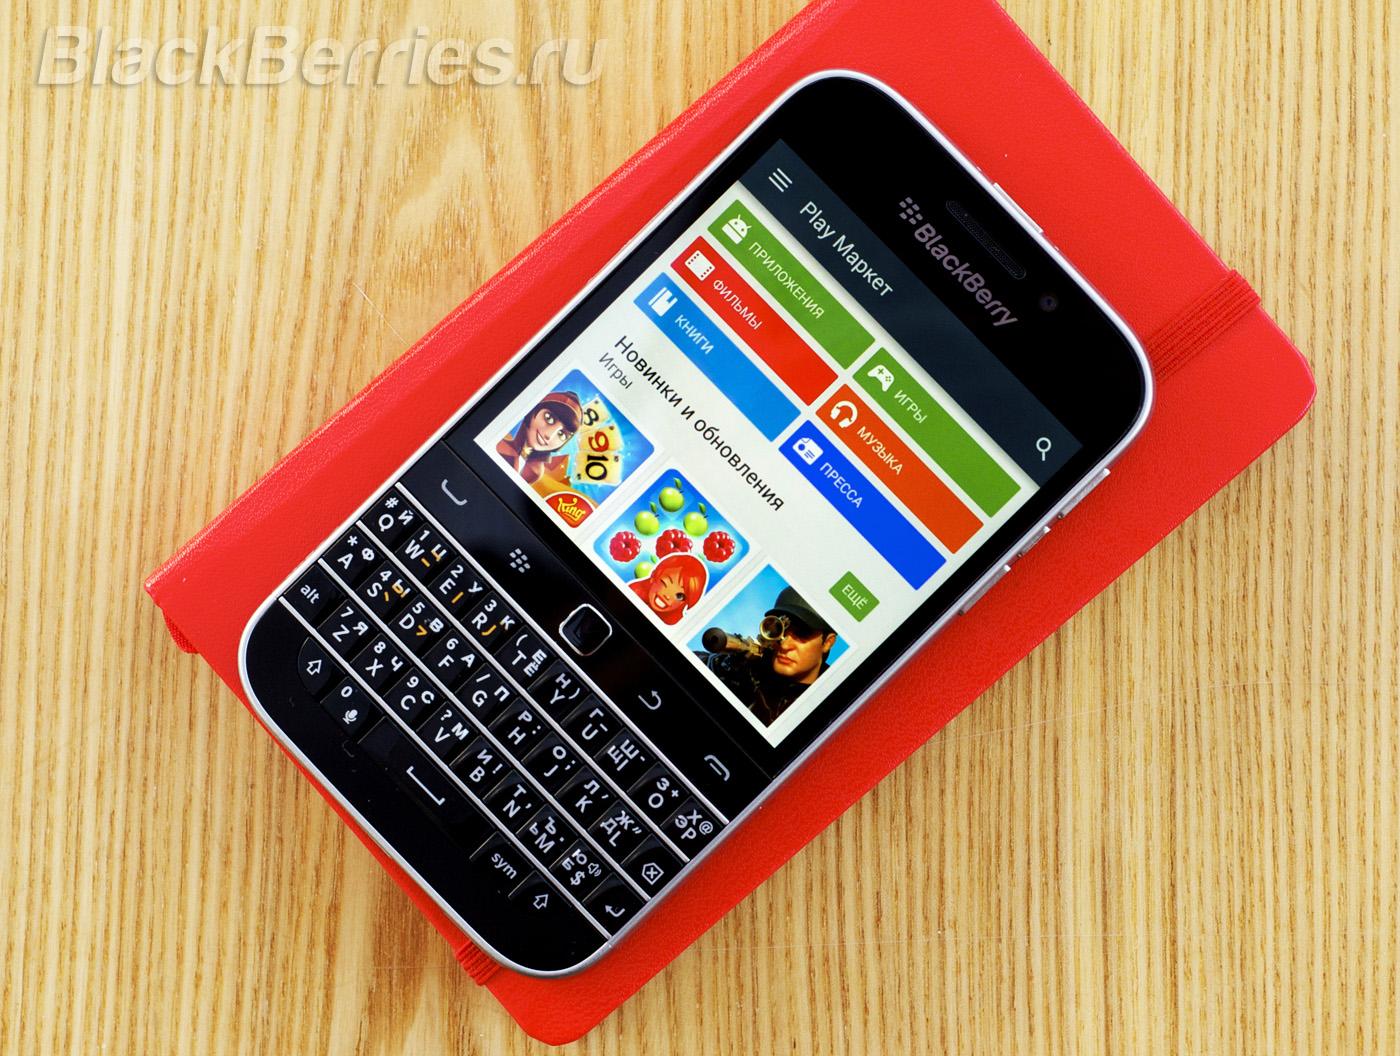 BlackBerry-Google-Play